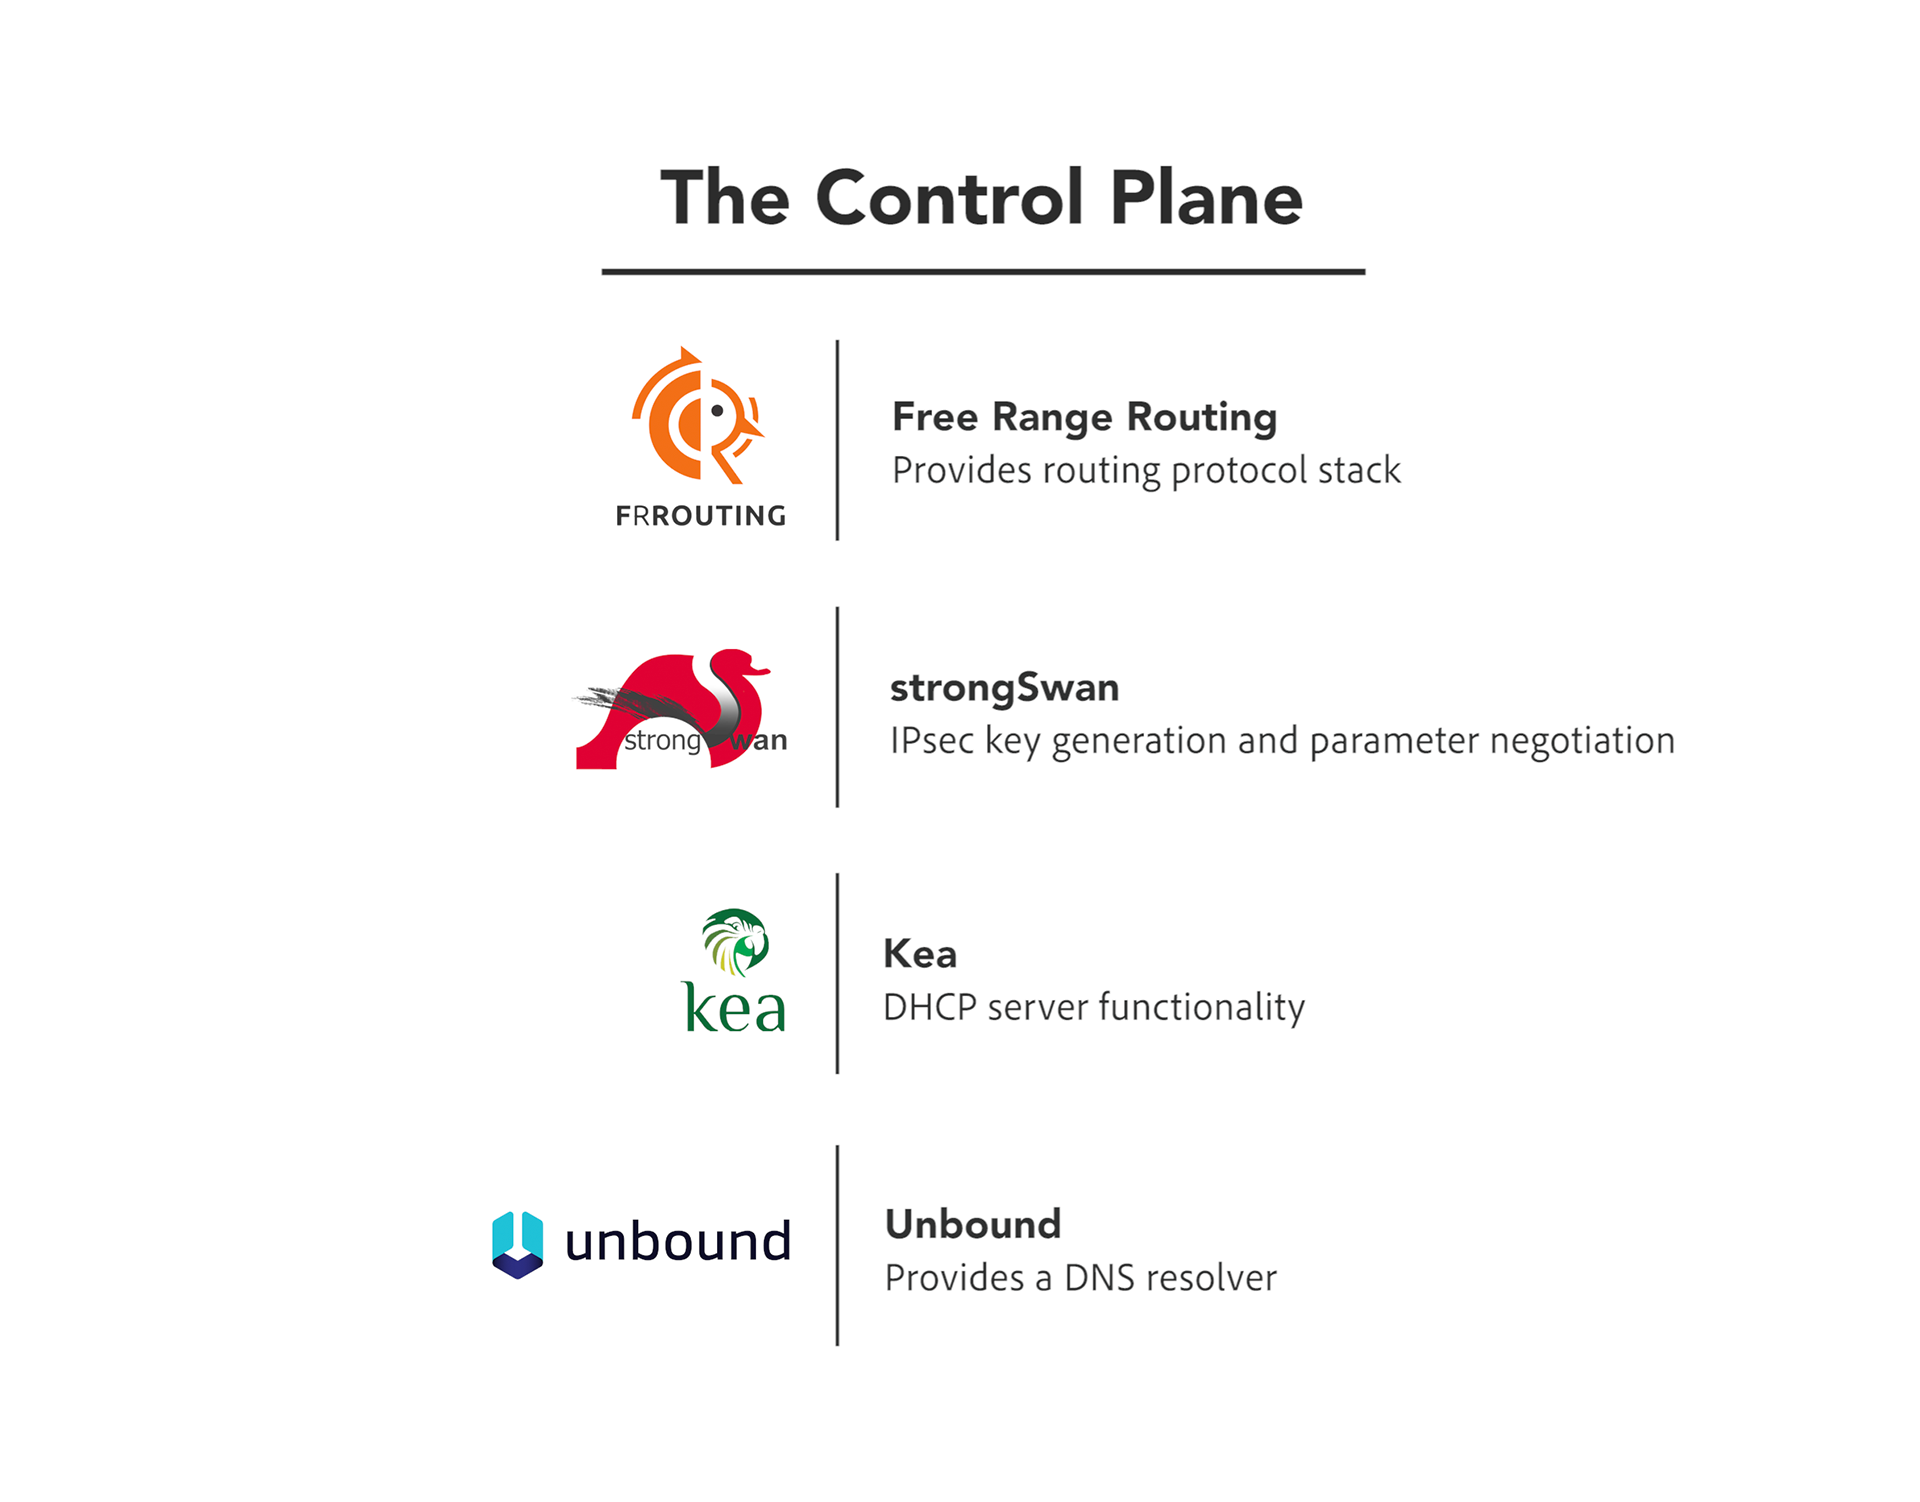 The Control Plane